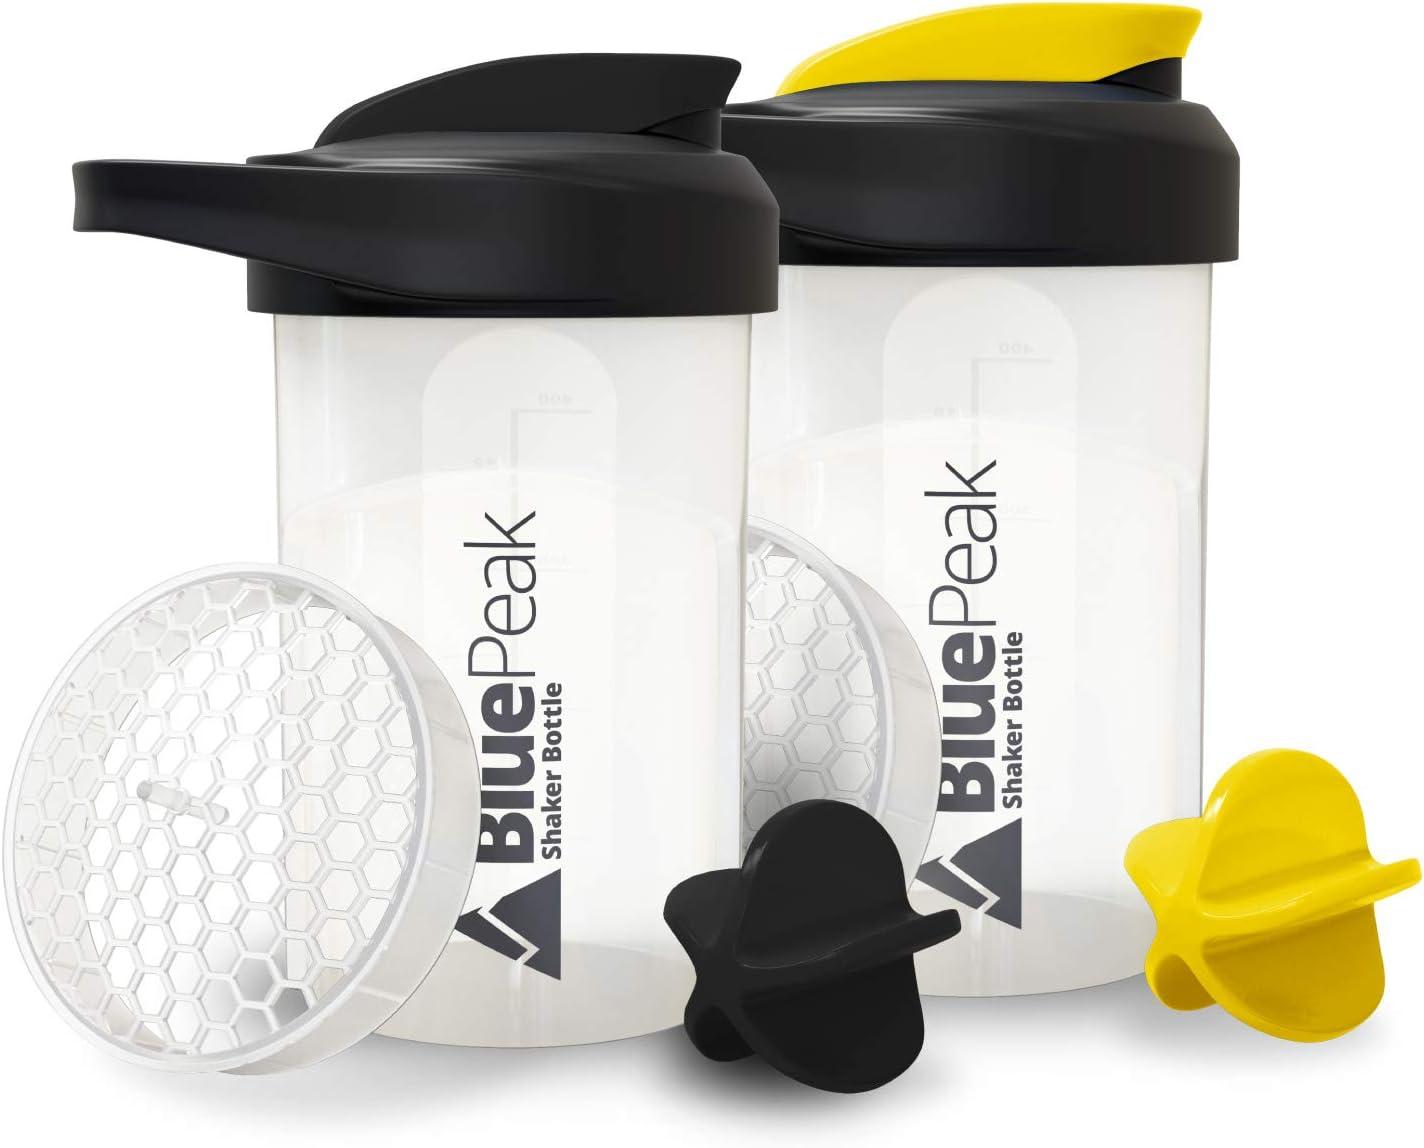 Gutyan Edelstahl Blender Mixing Ball Rostfrei Kugel Protein Mixer Shaker Bottle Cup Wire Whisk 5 pcs